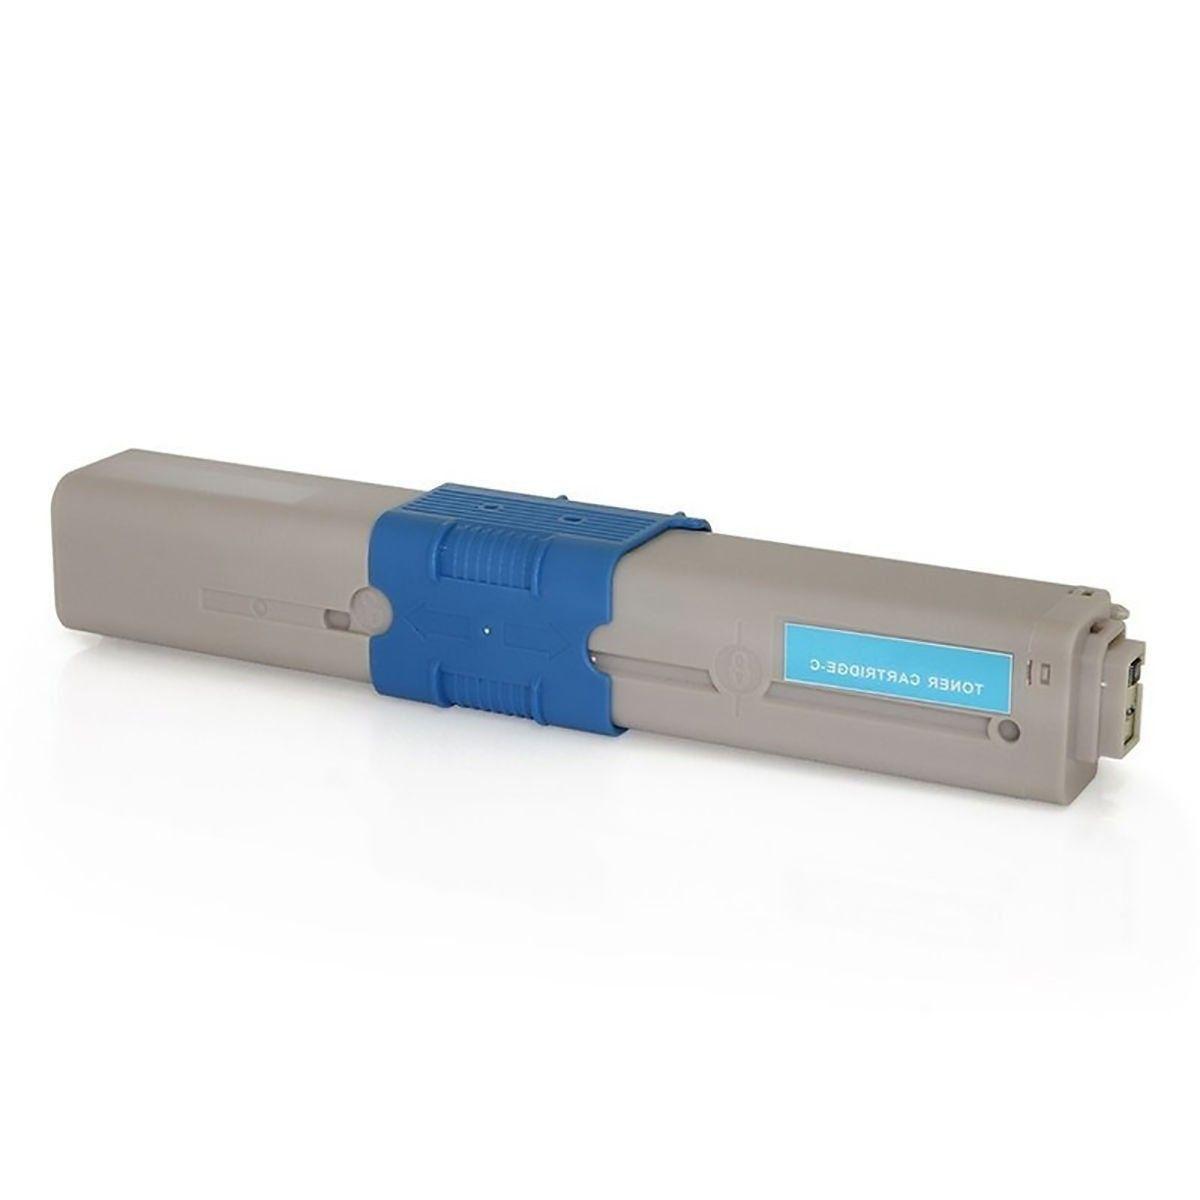 Compatível: Toner C330 C530 para Okidata MC351 C310n MC361dn C331 MC362 CE310dn MC561 C530dn C330dn / Ciano / 3.000